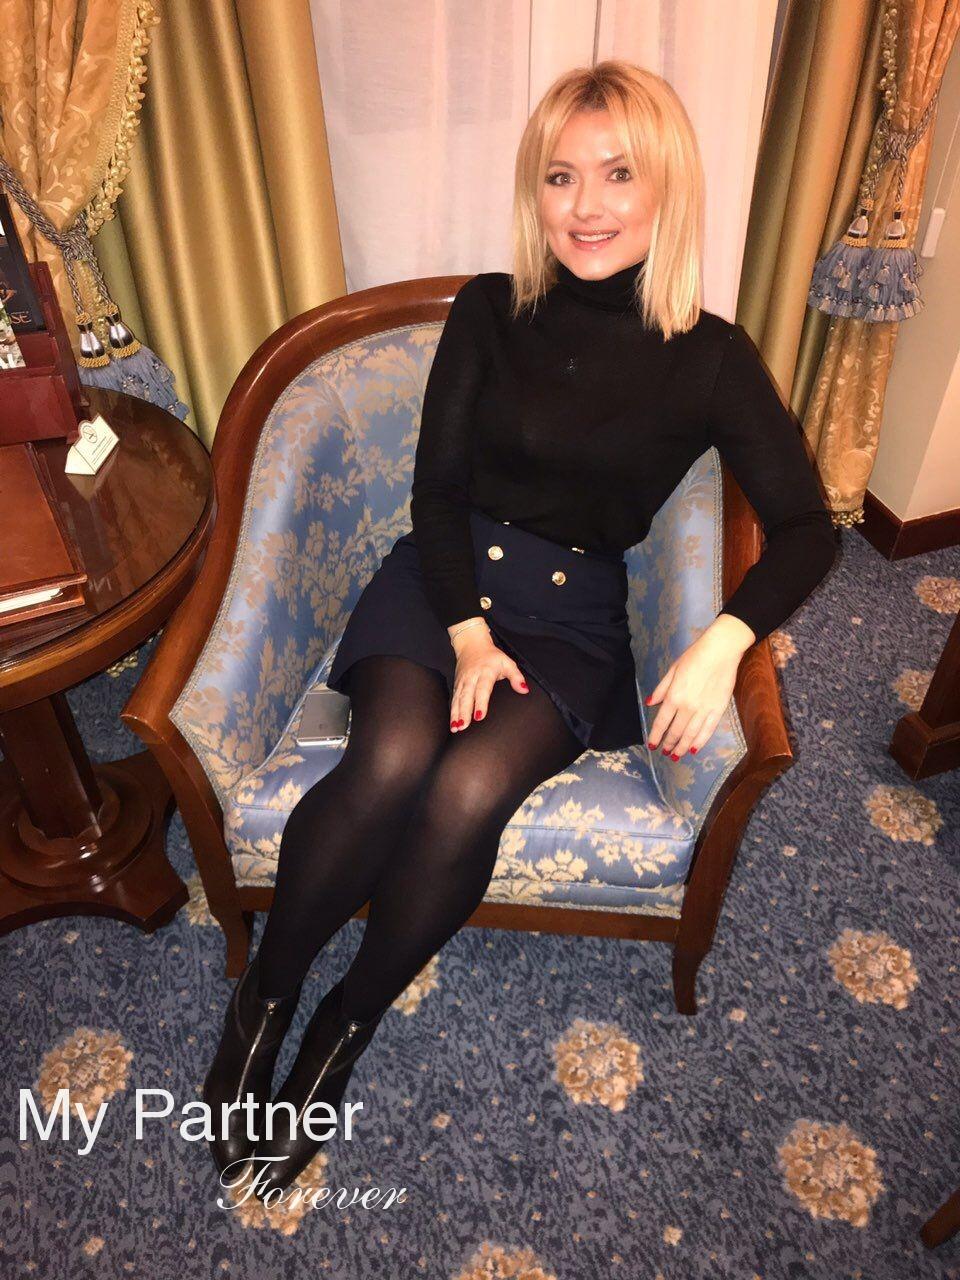 Stunning Lady from Ukraine - Olga from Kiev, Ukraine